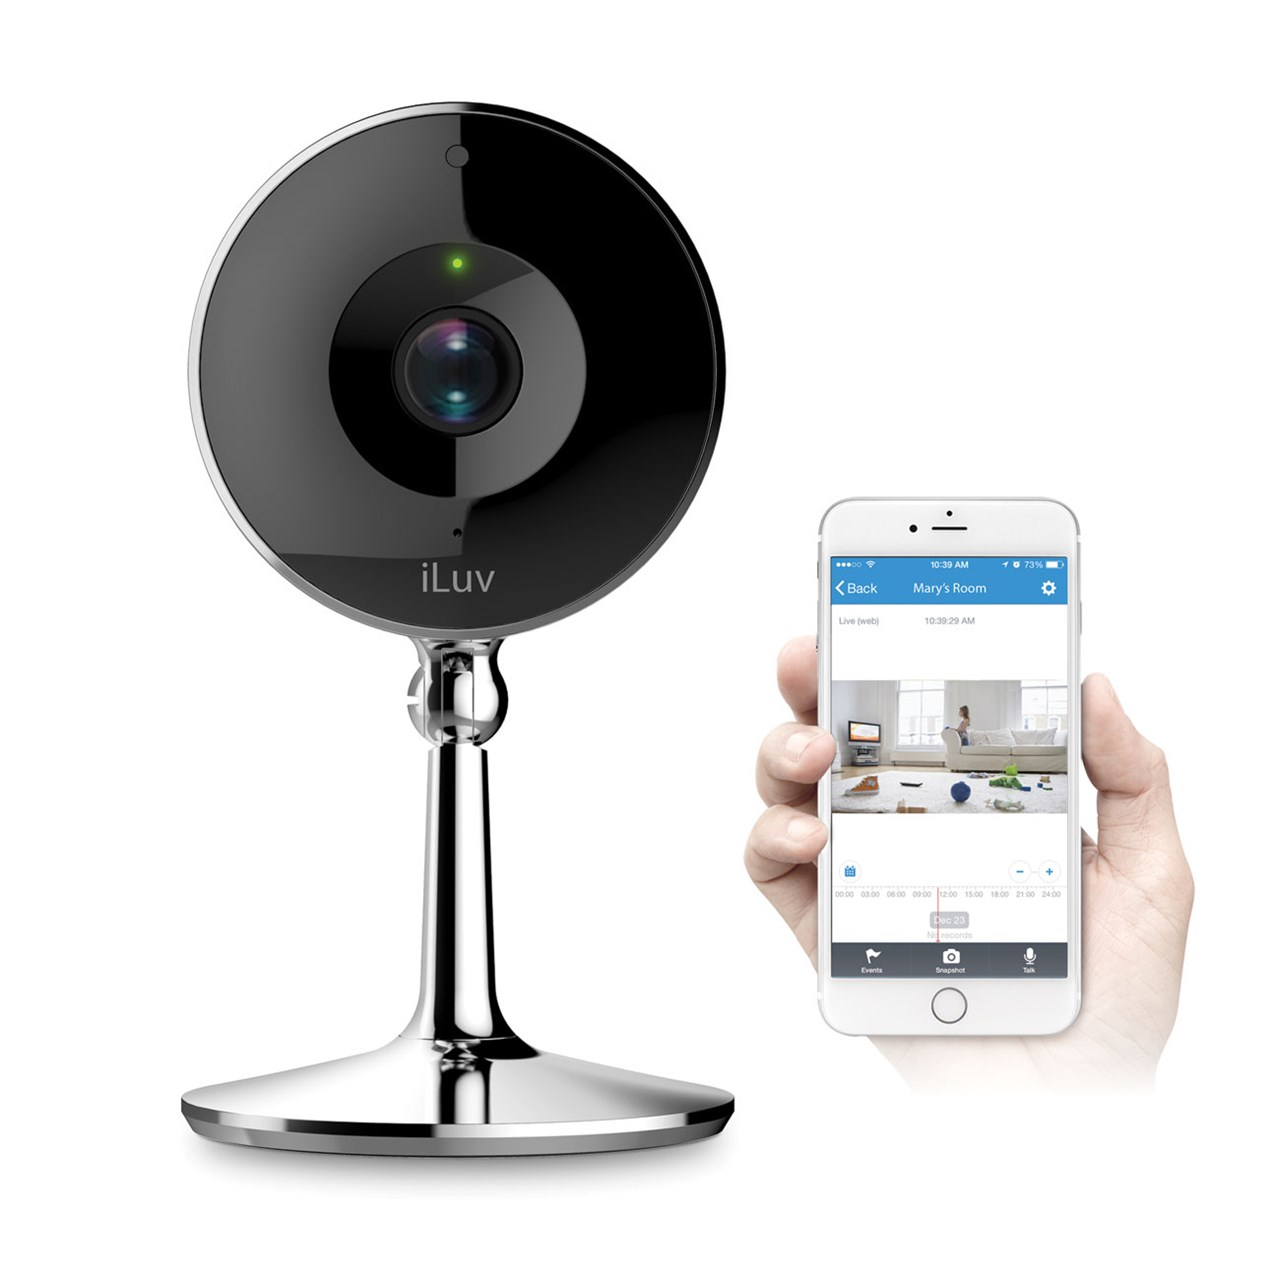 iLuv mySight 2K Wi-Fi Cloud-Based HD Video Camera by iLuv